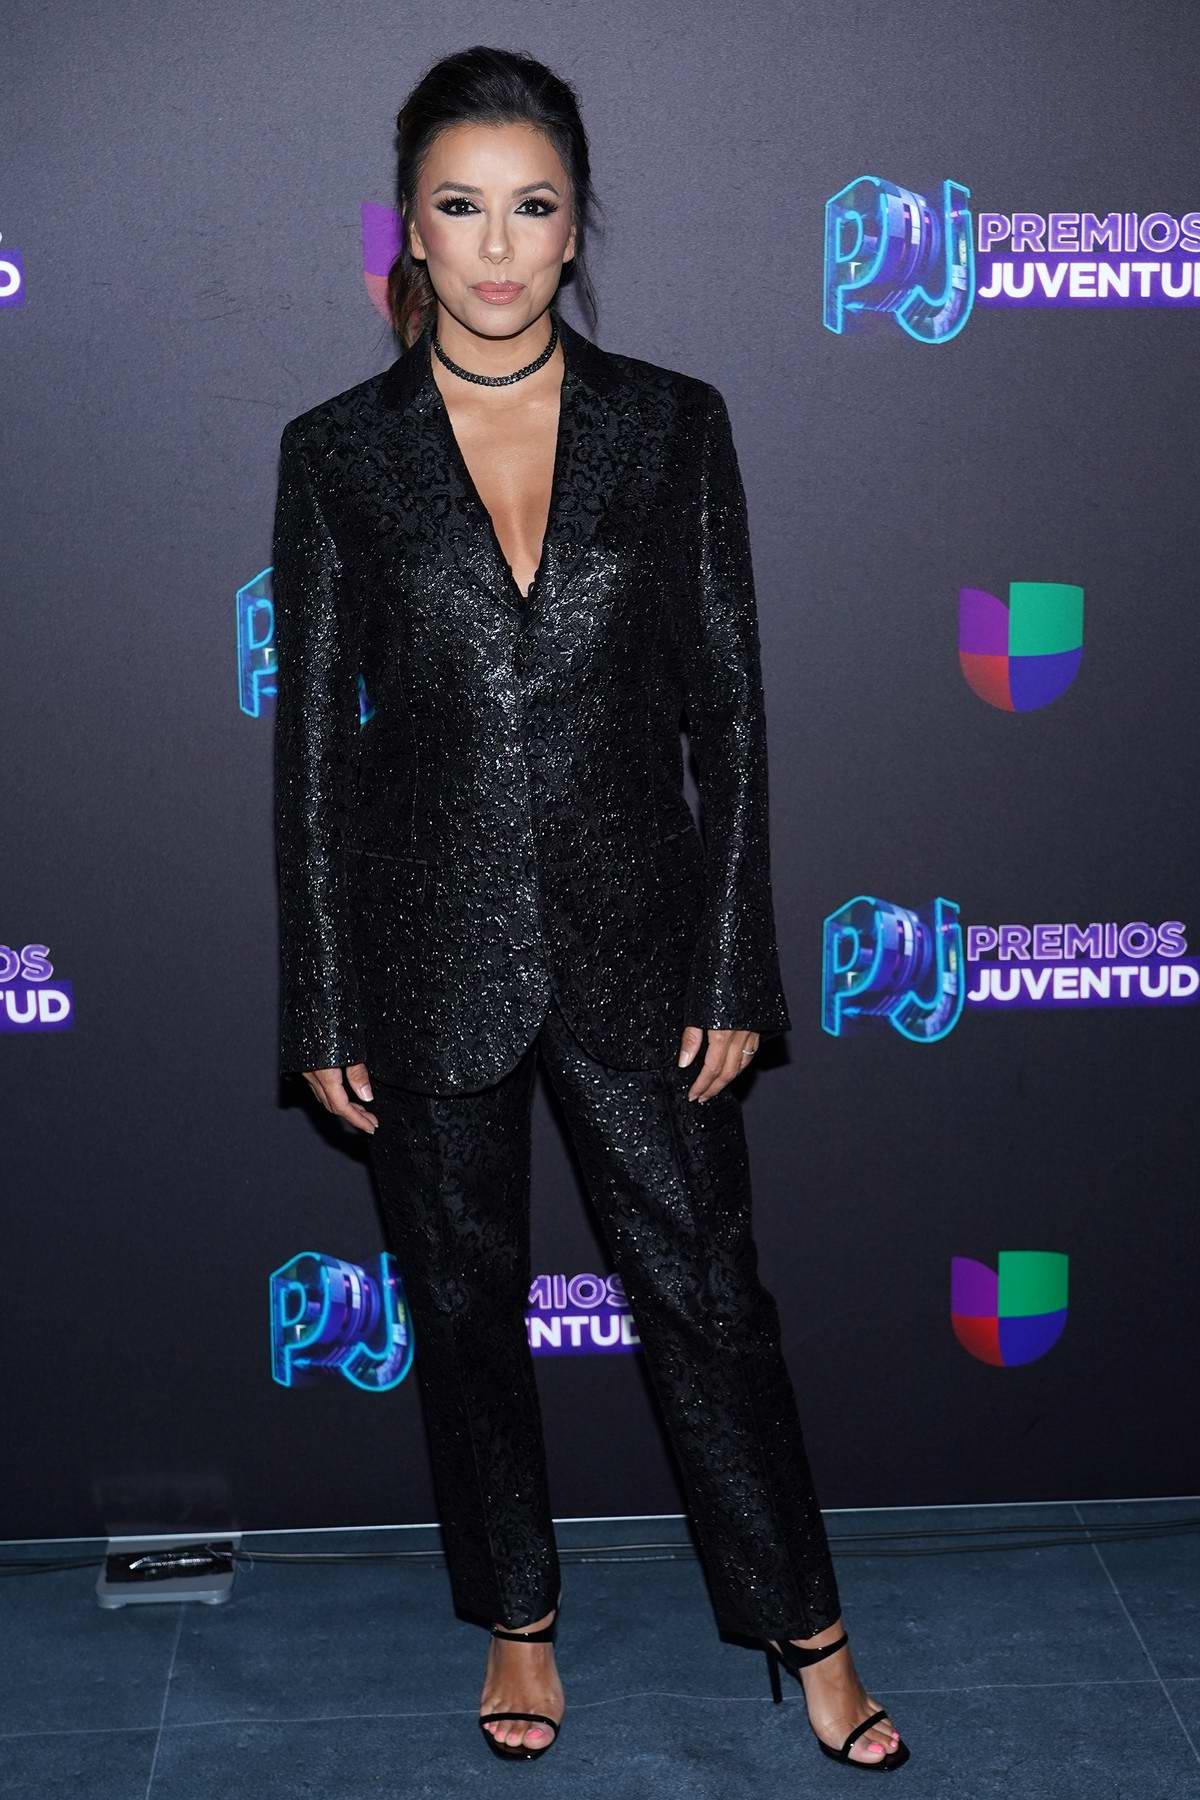 Eva Longoria attends Premio Juventud 2019 at Watsco Center in Coral Gables, Florida